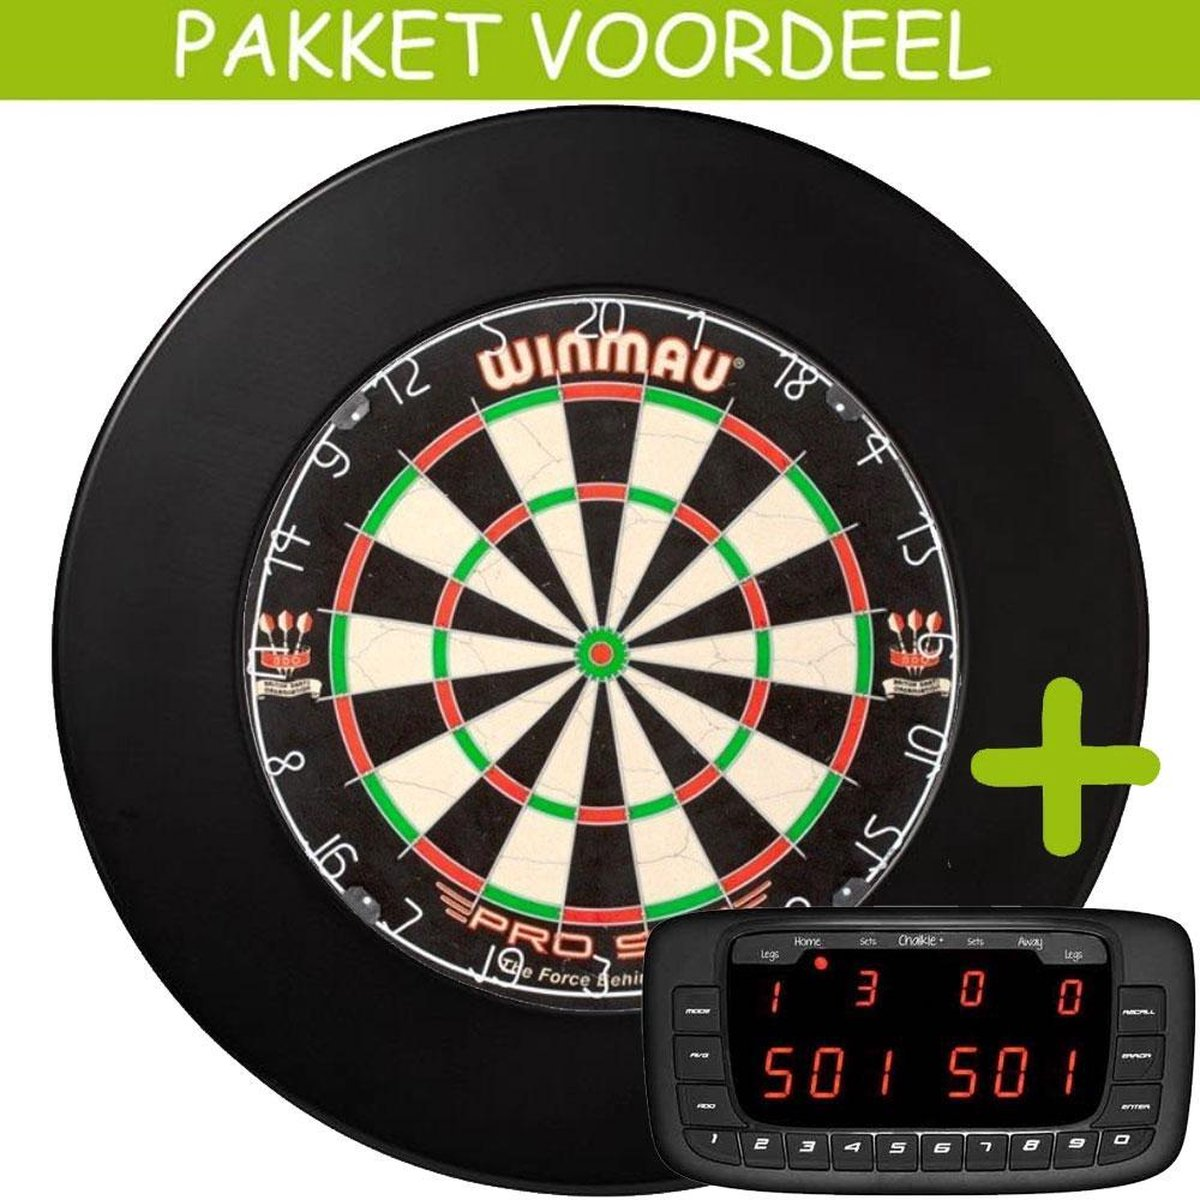 Elektronisch Dart Scorebord VoordeelPakket (Chalkie + ) - Pro SFB - Rubberen Surround (Zwart)